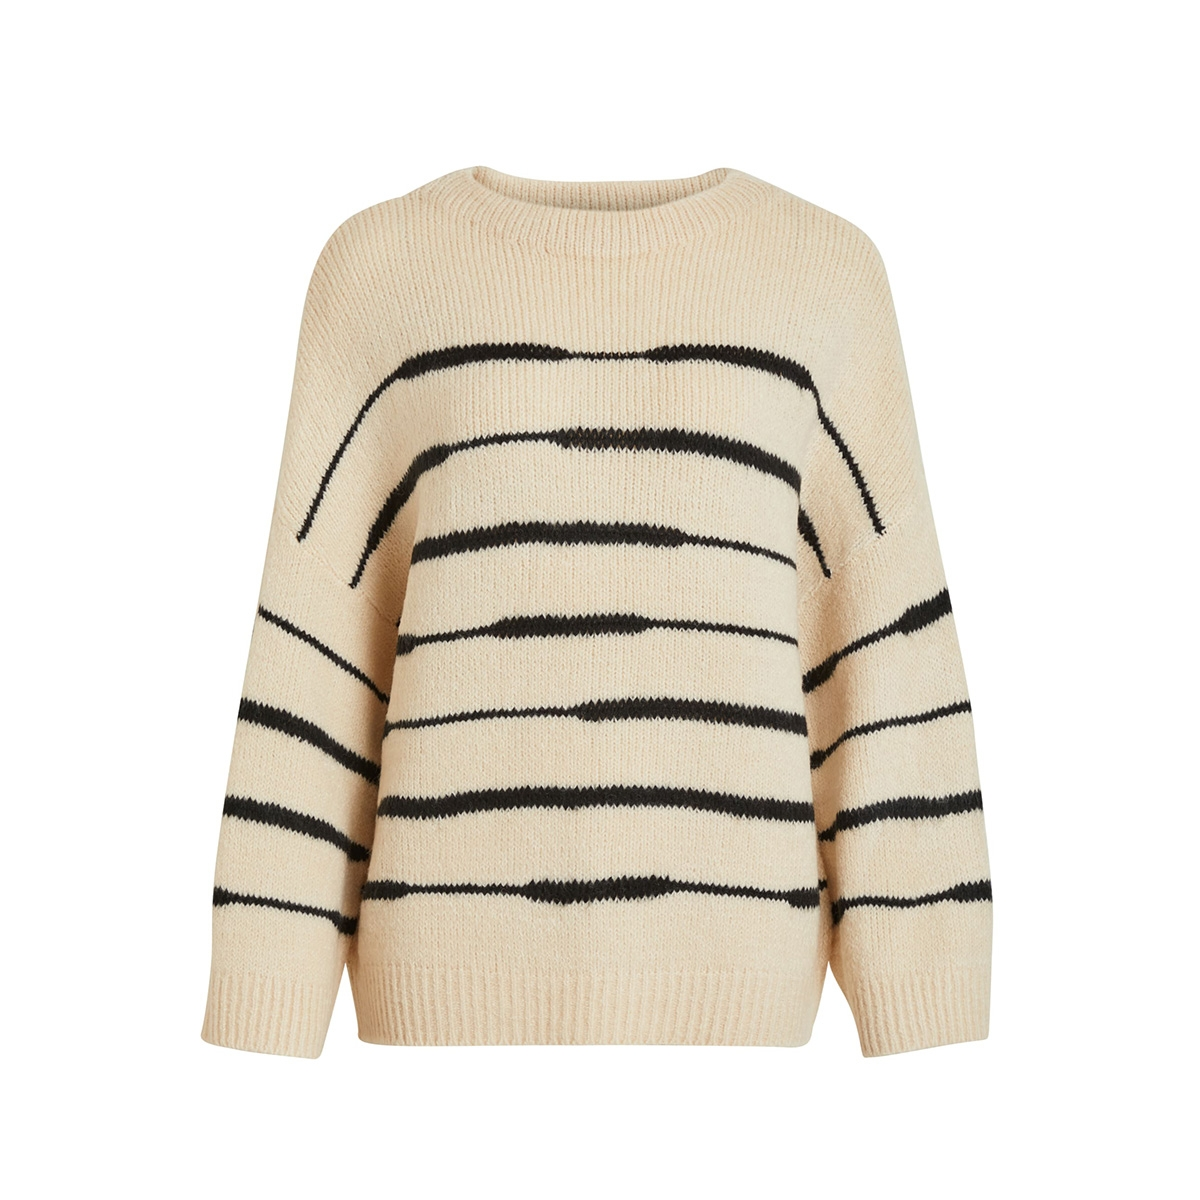 viziggo knit l/s funnel neck top/de 14054767 vila trui sandshell/ w. black s